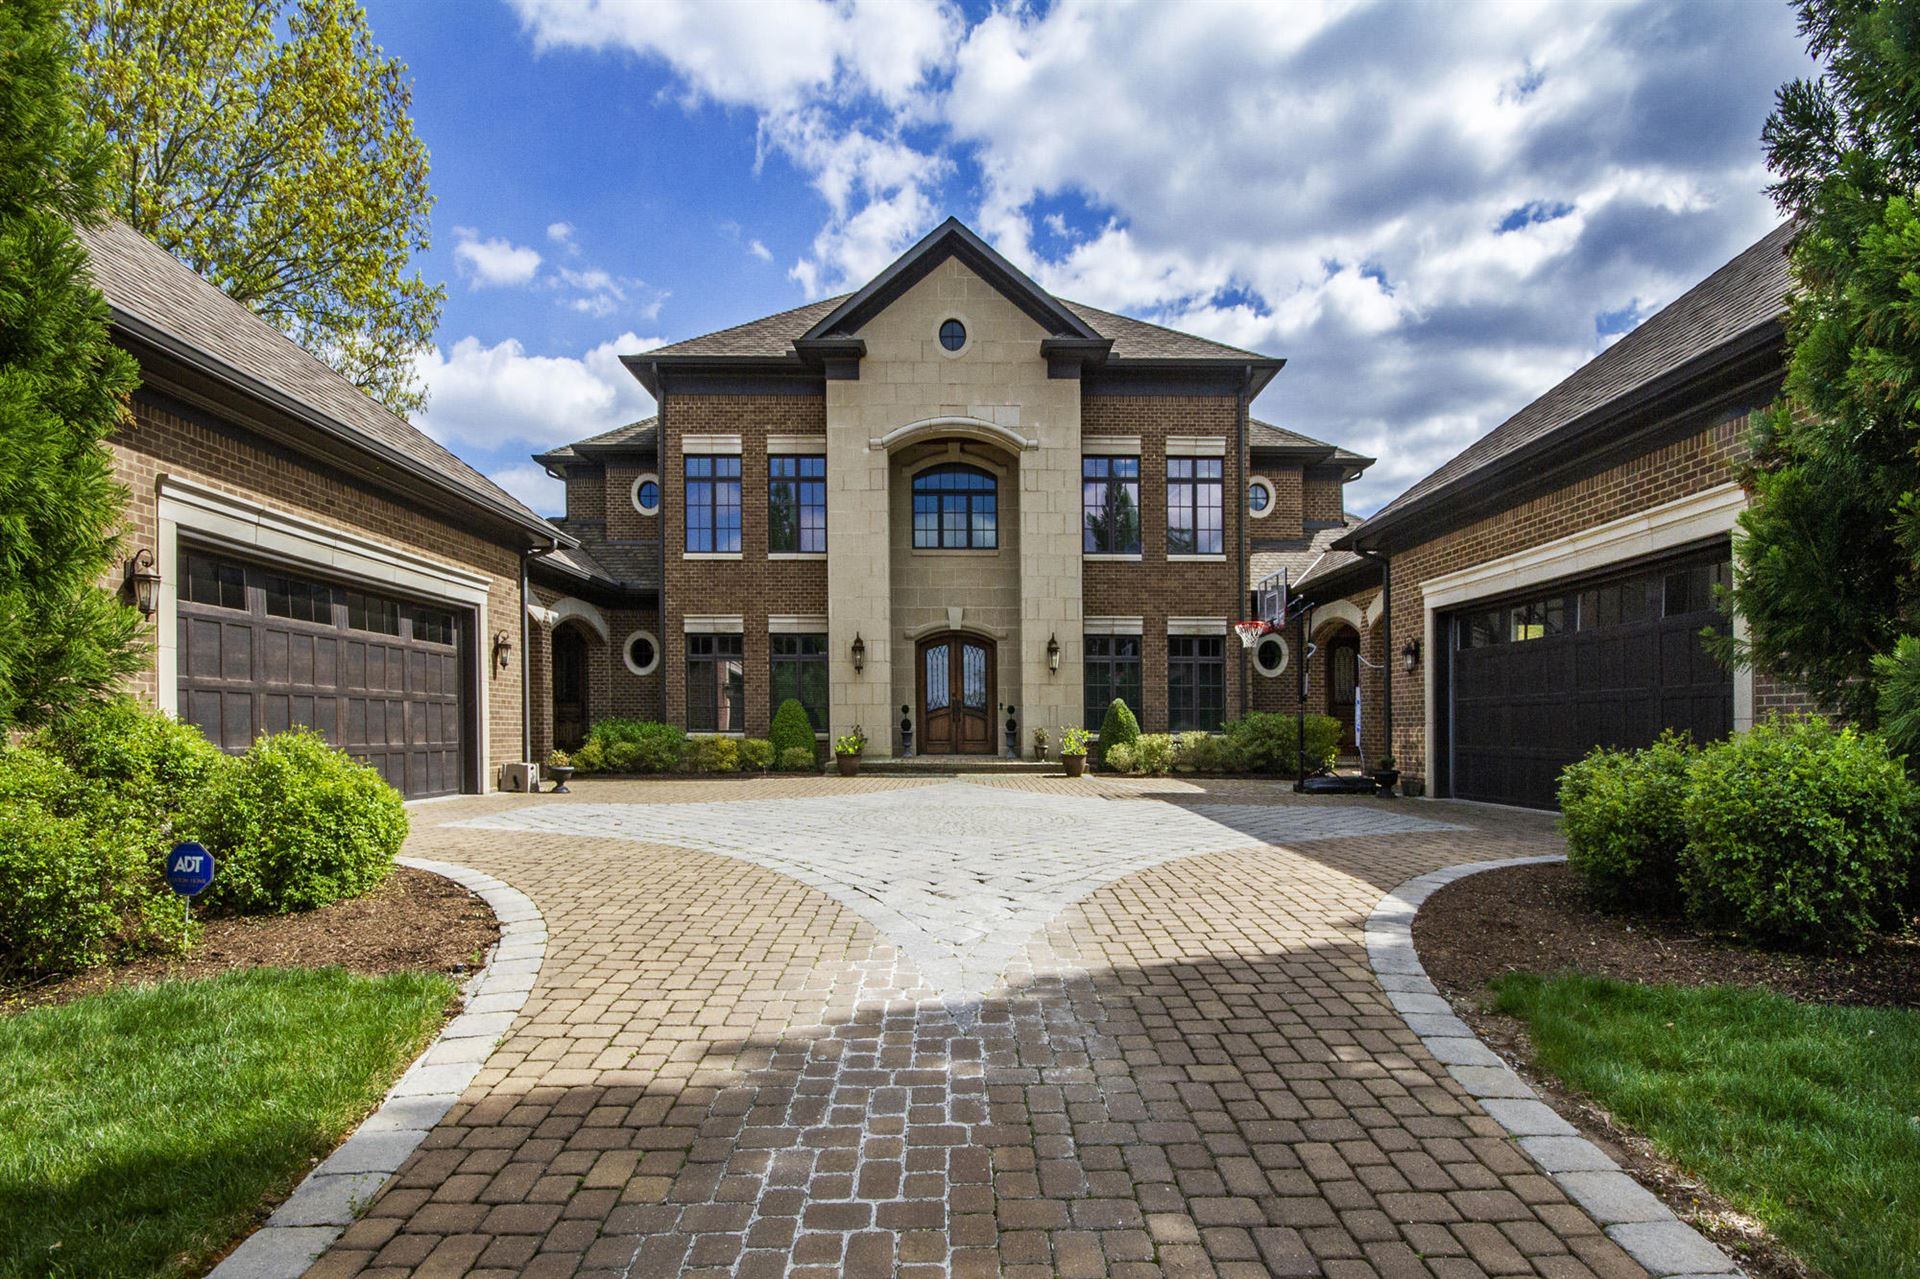 529 Stone Vista Lane, Knoxville, TN 37934 - MLS#: 1148251